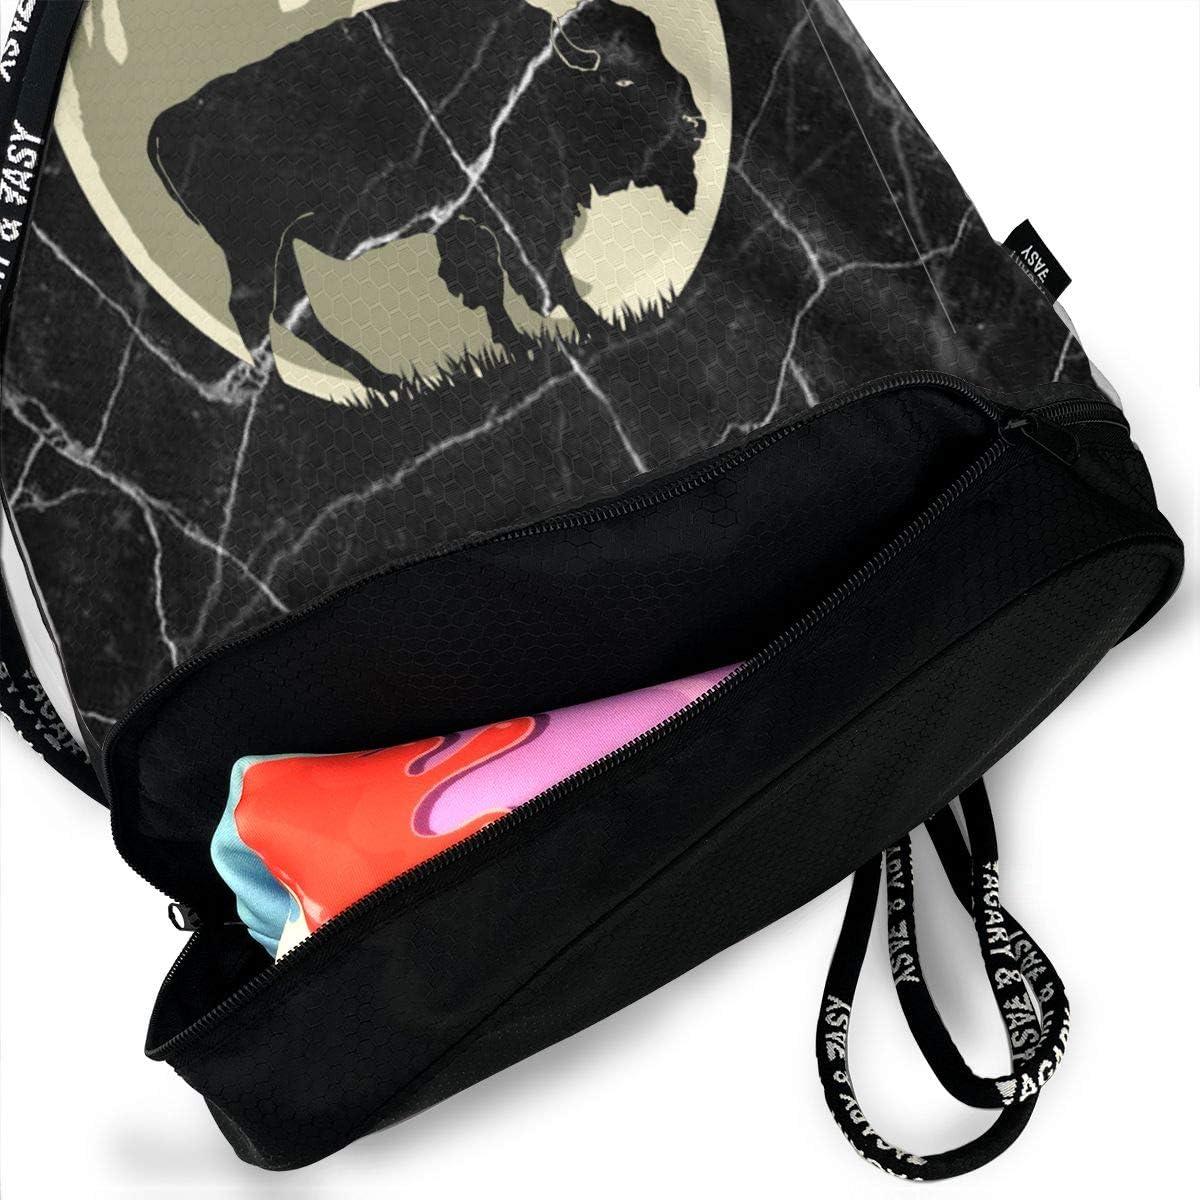 Drawstring Pack Bison Cute Halloween Men /& Women Yoga Dance Travel Shoulder Bags